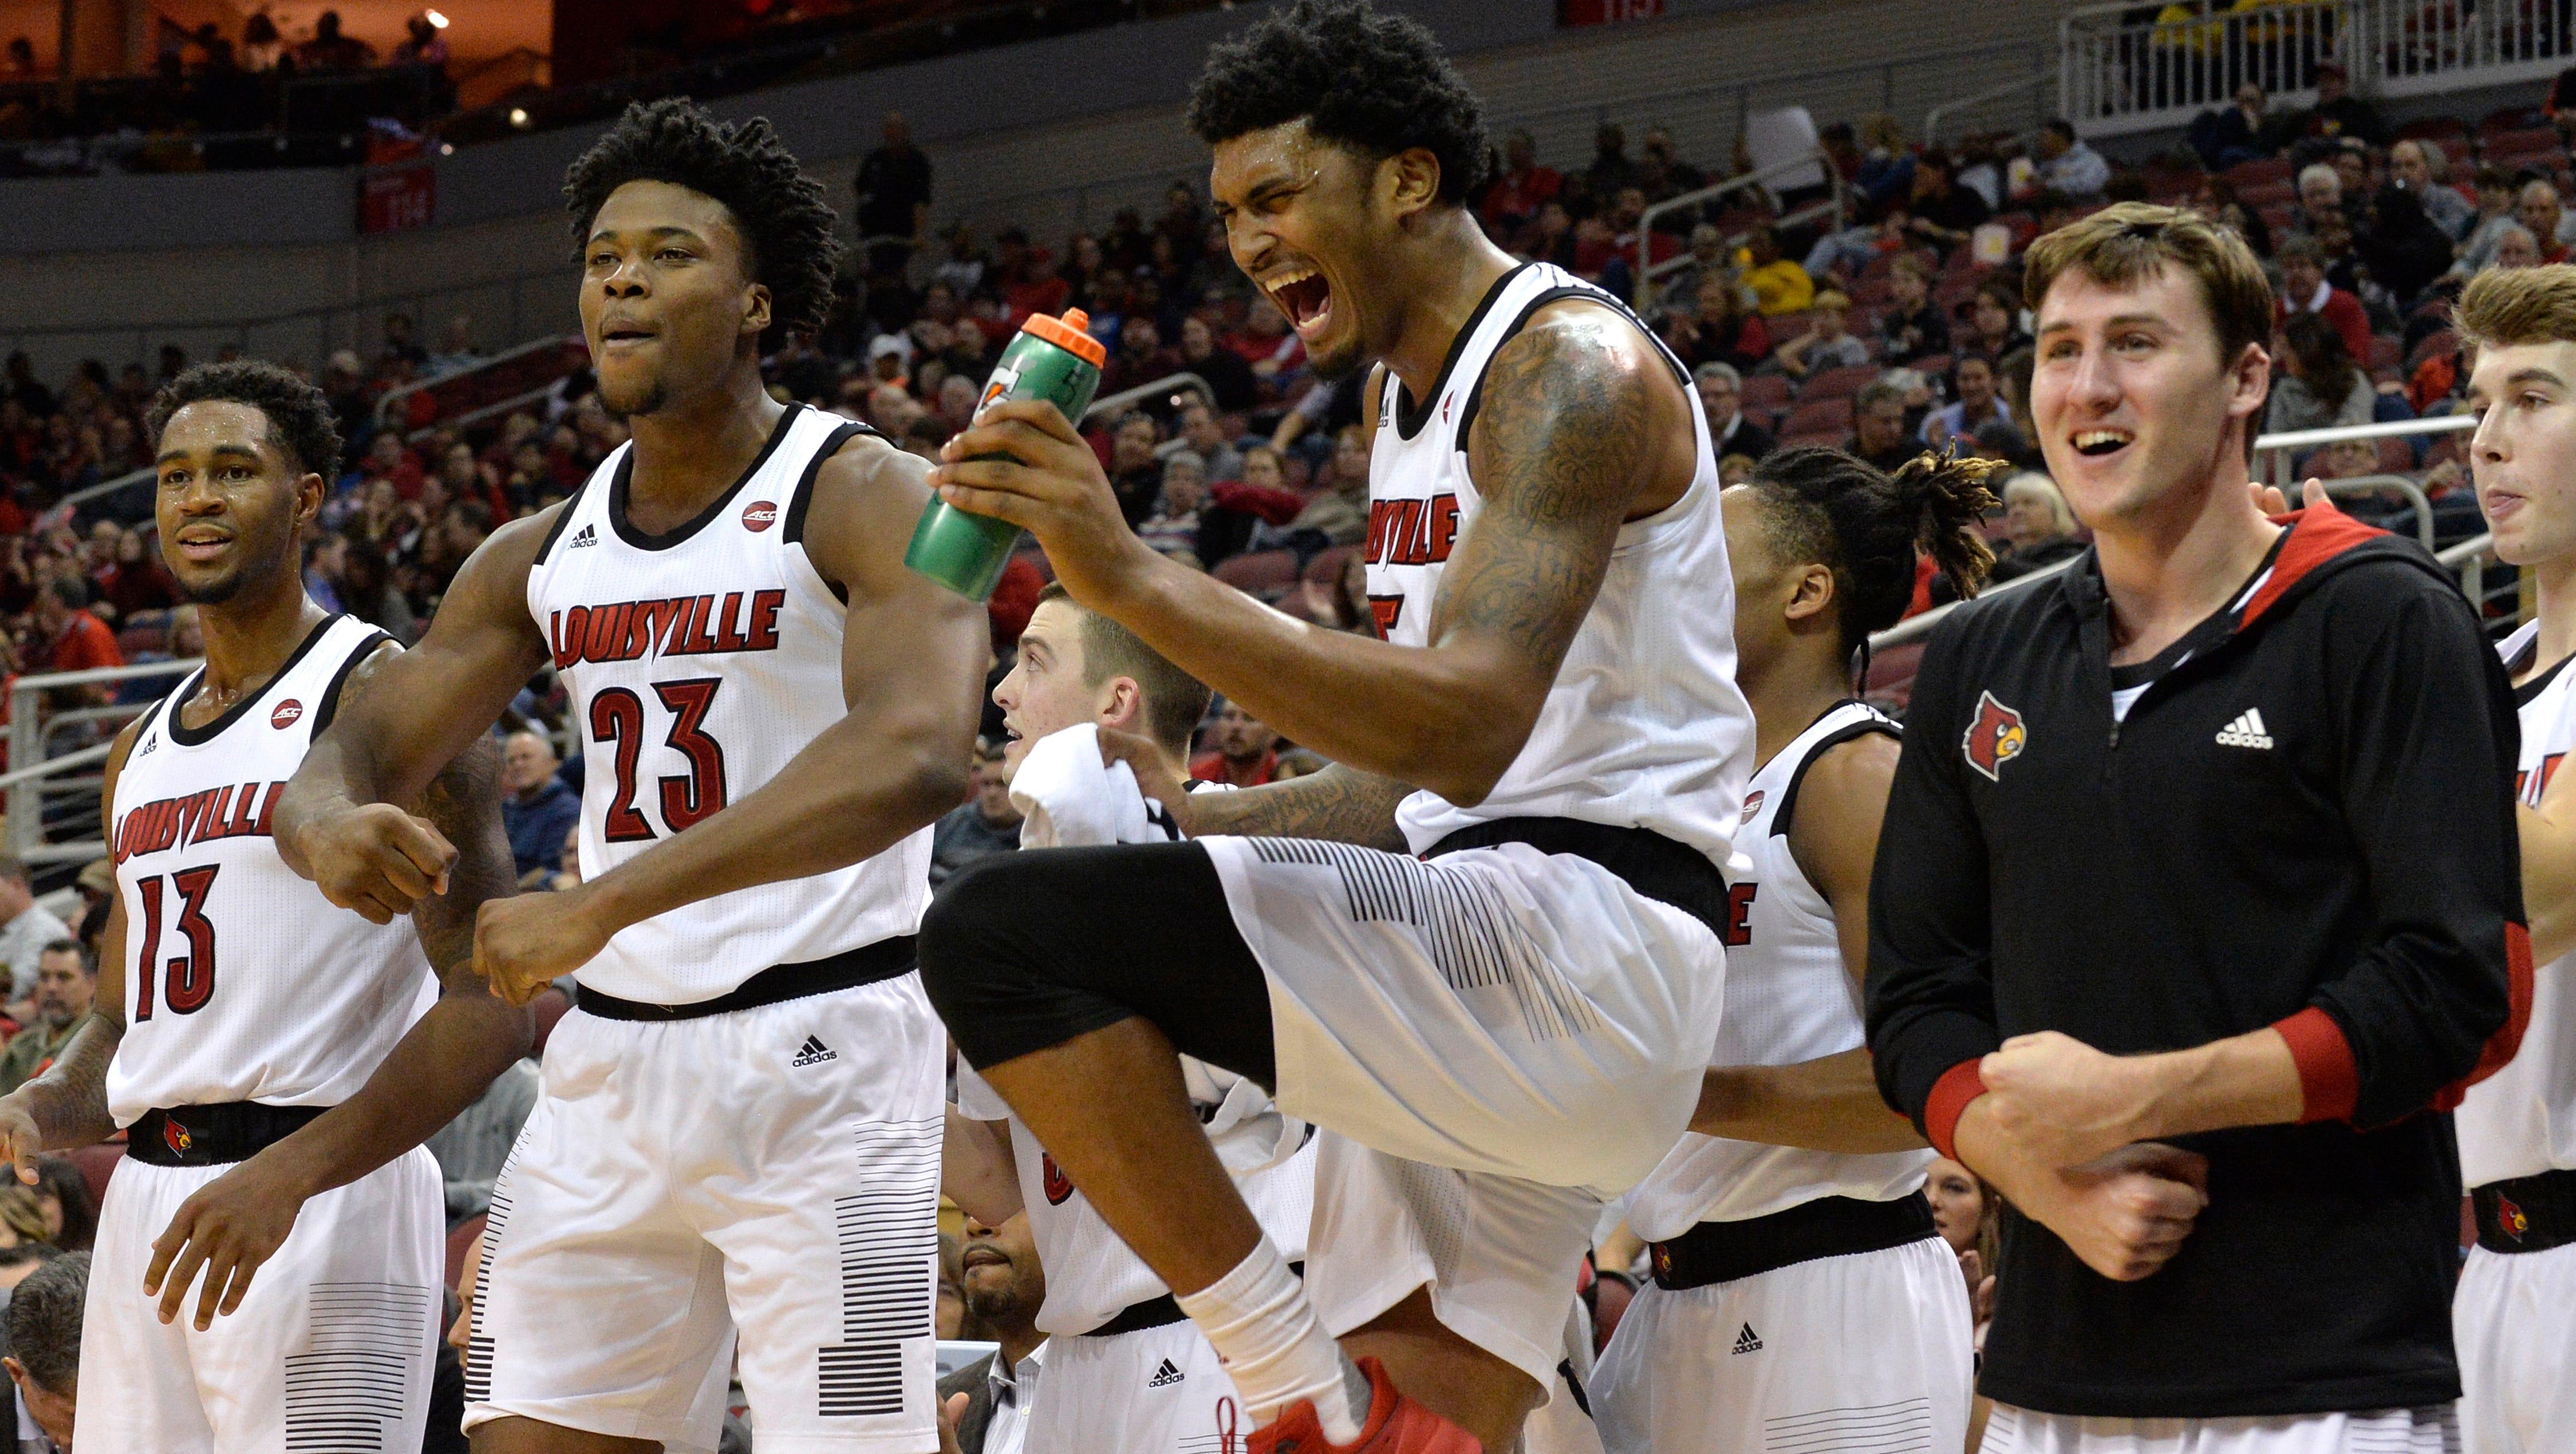 Louisville Basketball Vs Nicholls State Tv Radio Streams